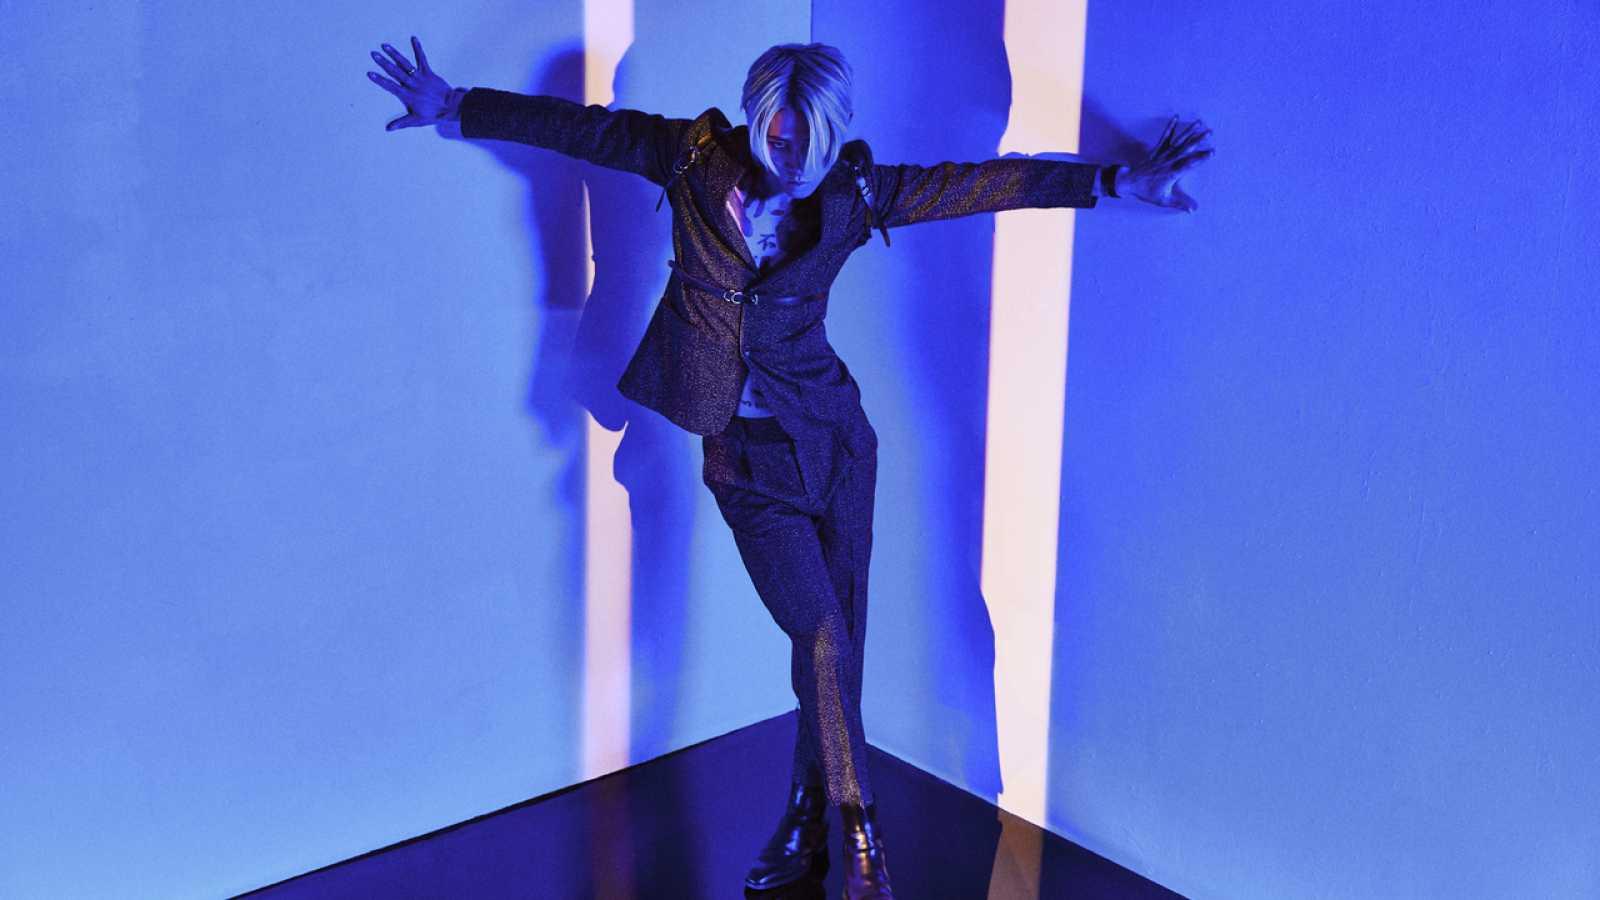 MIYAVI Announces Virtual Performance from Art Gallery © MIYAVI. All Rights Reserved.